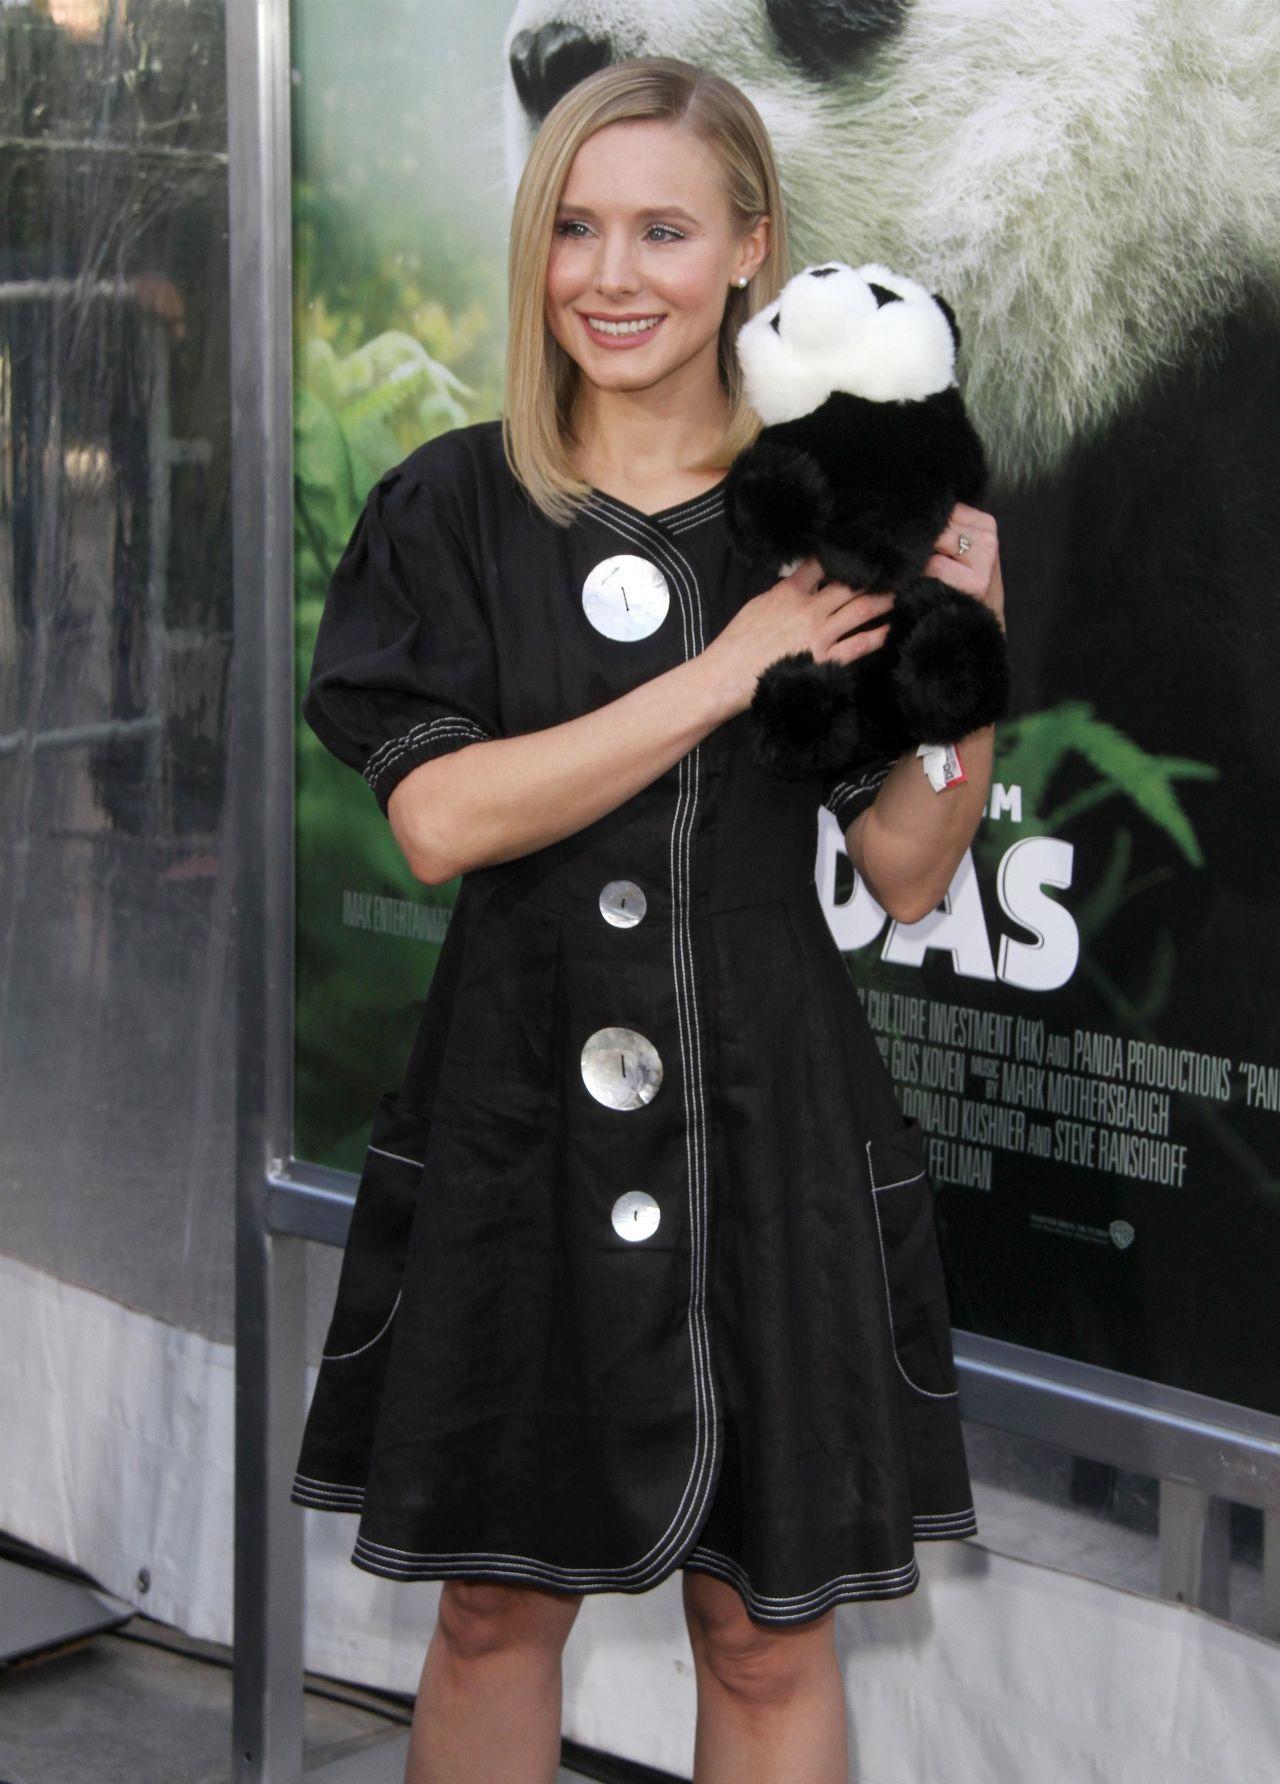 http://celebmafia.com/wp-content/uploads/2018/03/kristen-bell-pandas-premiere-in-hollywood-11.jpg